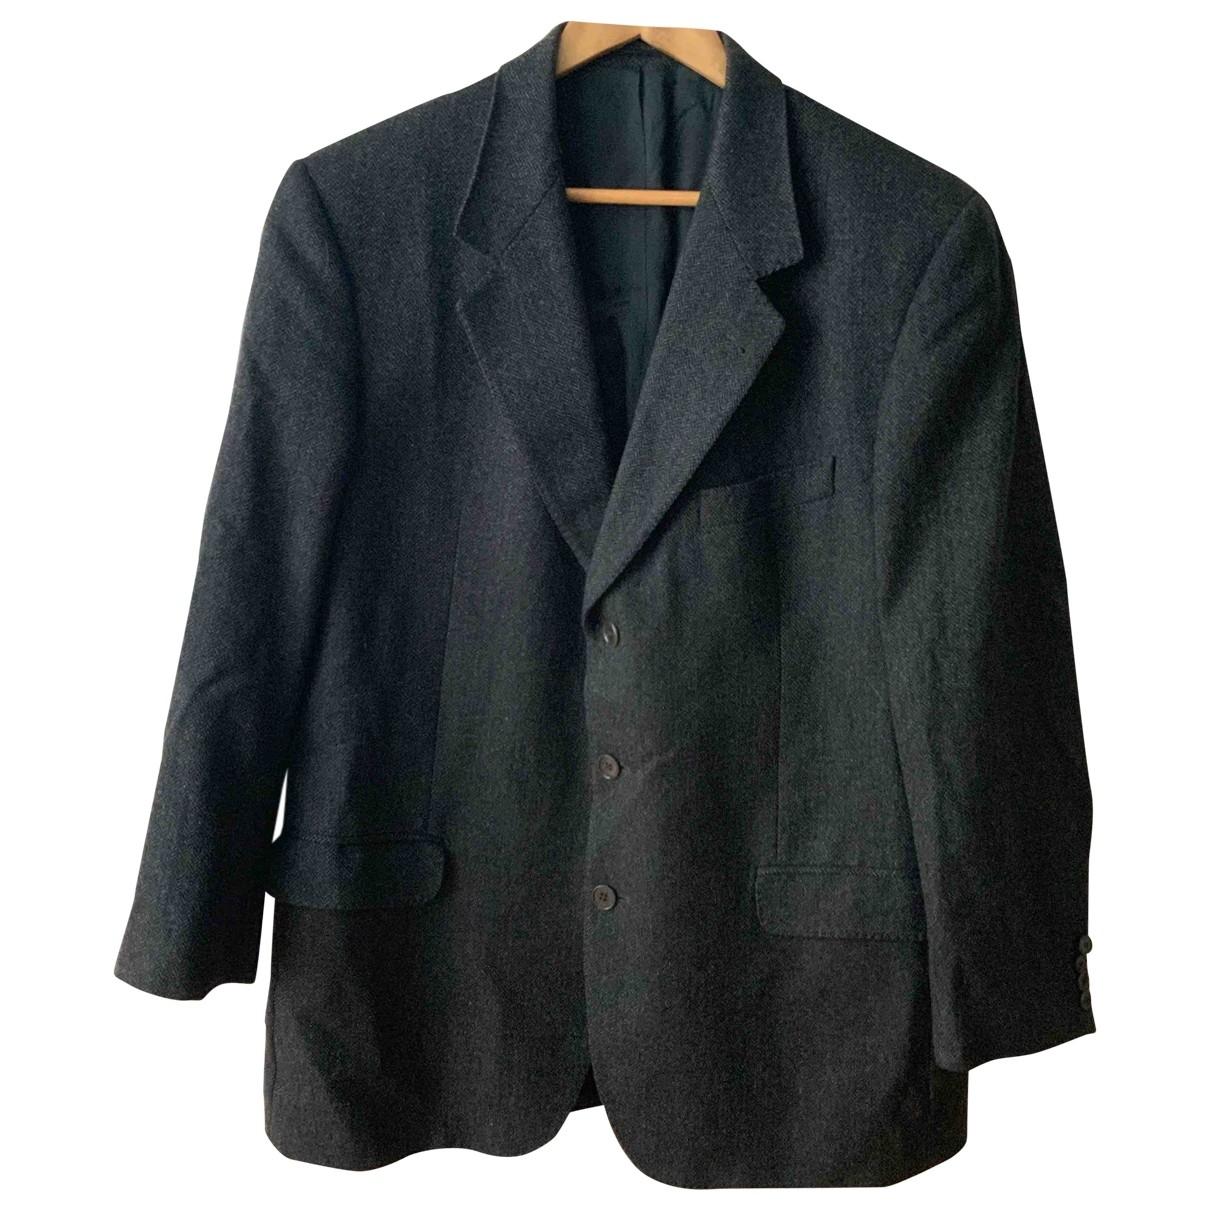 De Fursac \N Jacke in  Grau Wolle